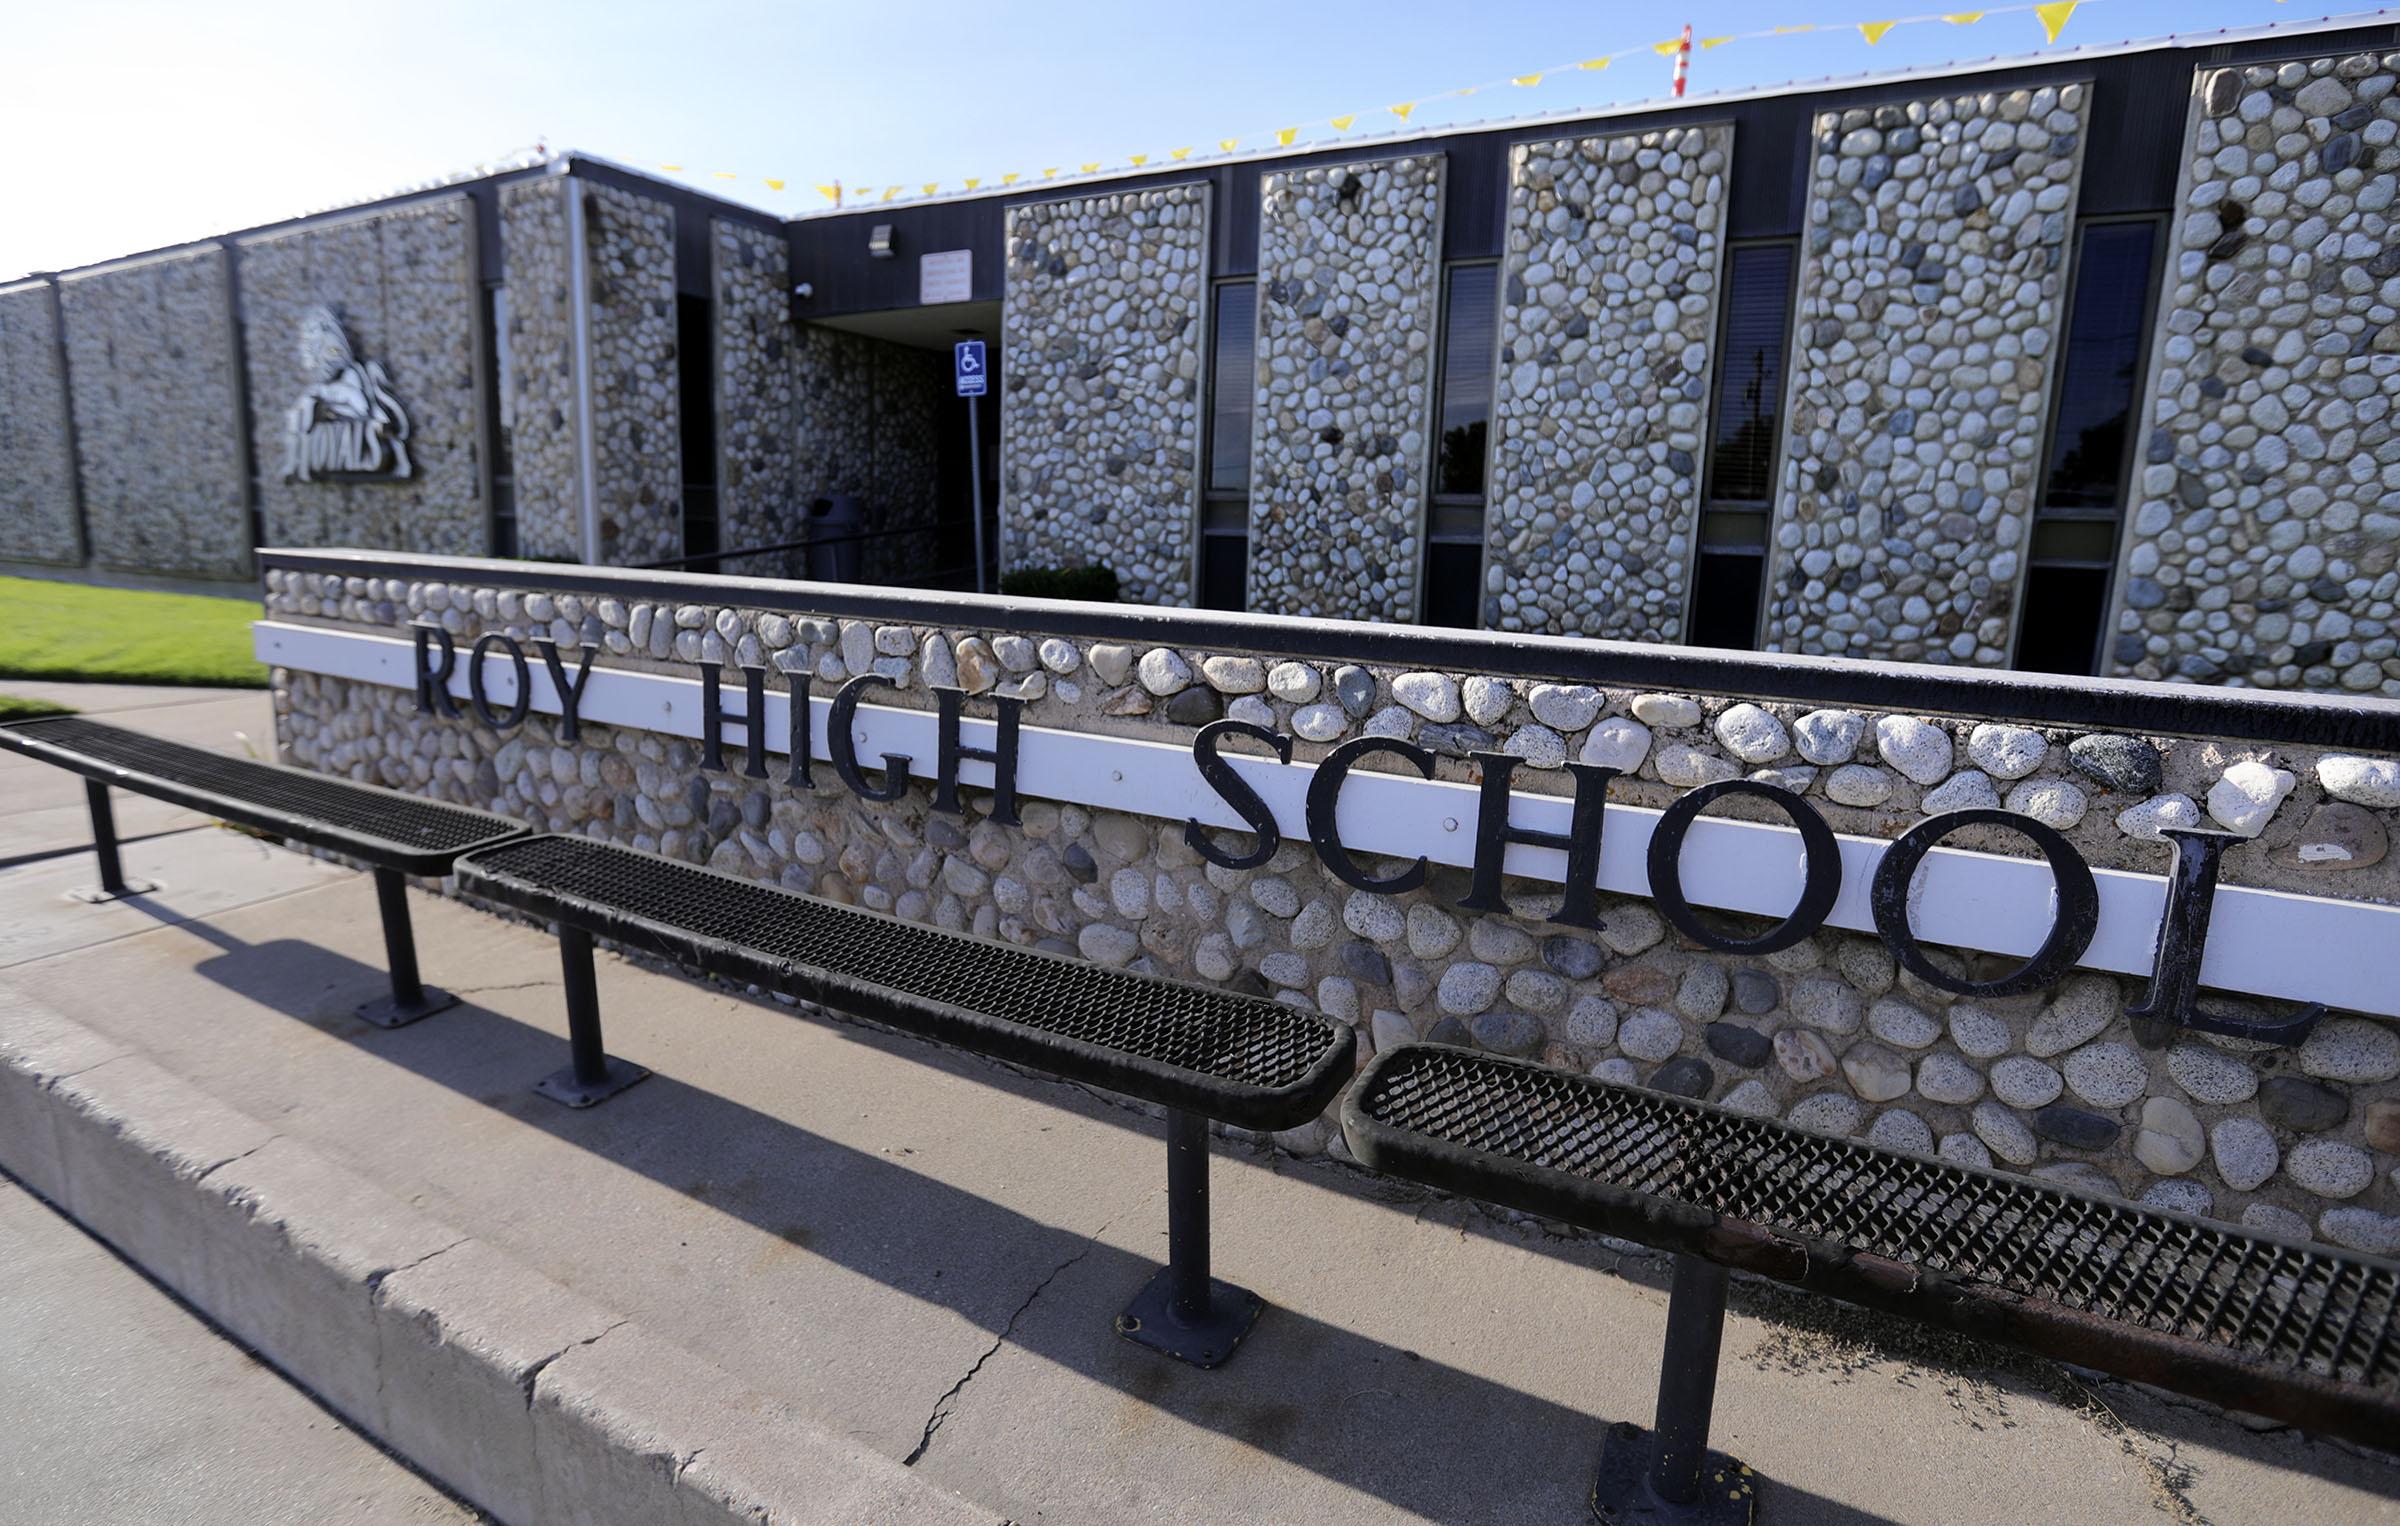 Roy High School dnstock sign